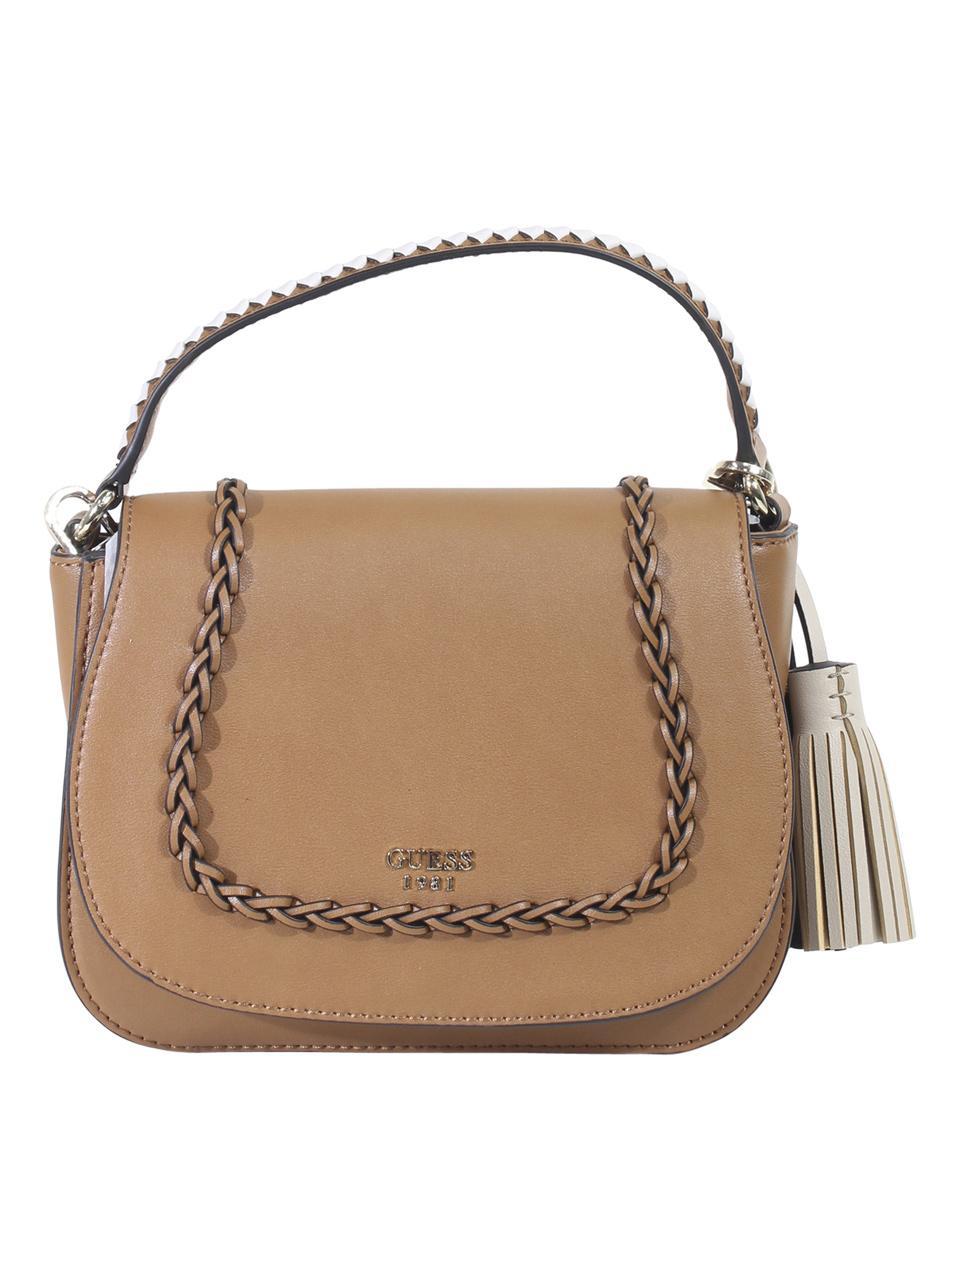 226e2e4ea4a Guess Women s Nessa Crossbody Handbag